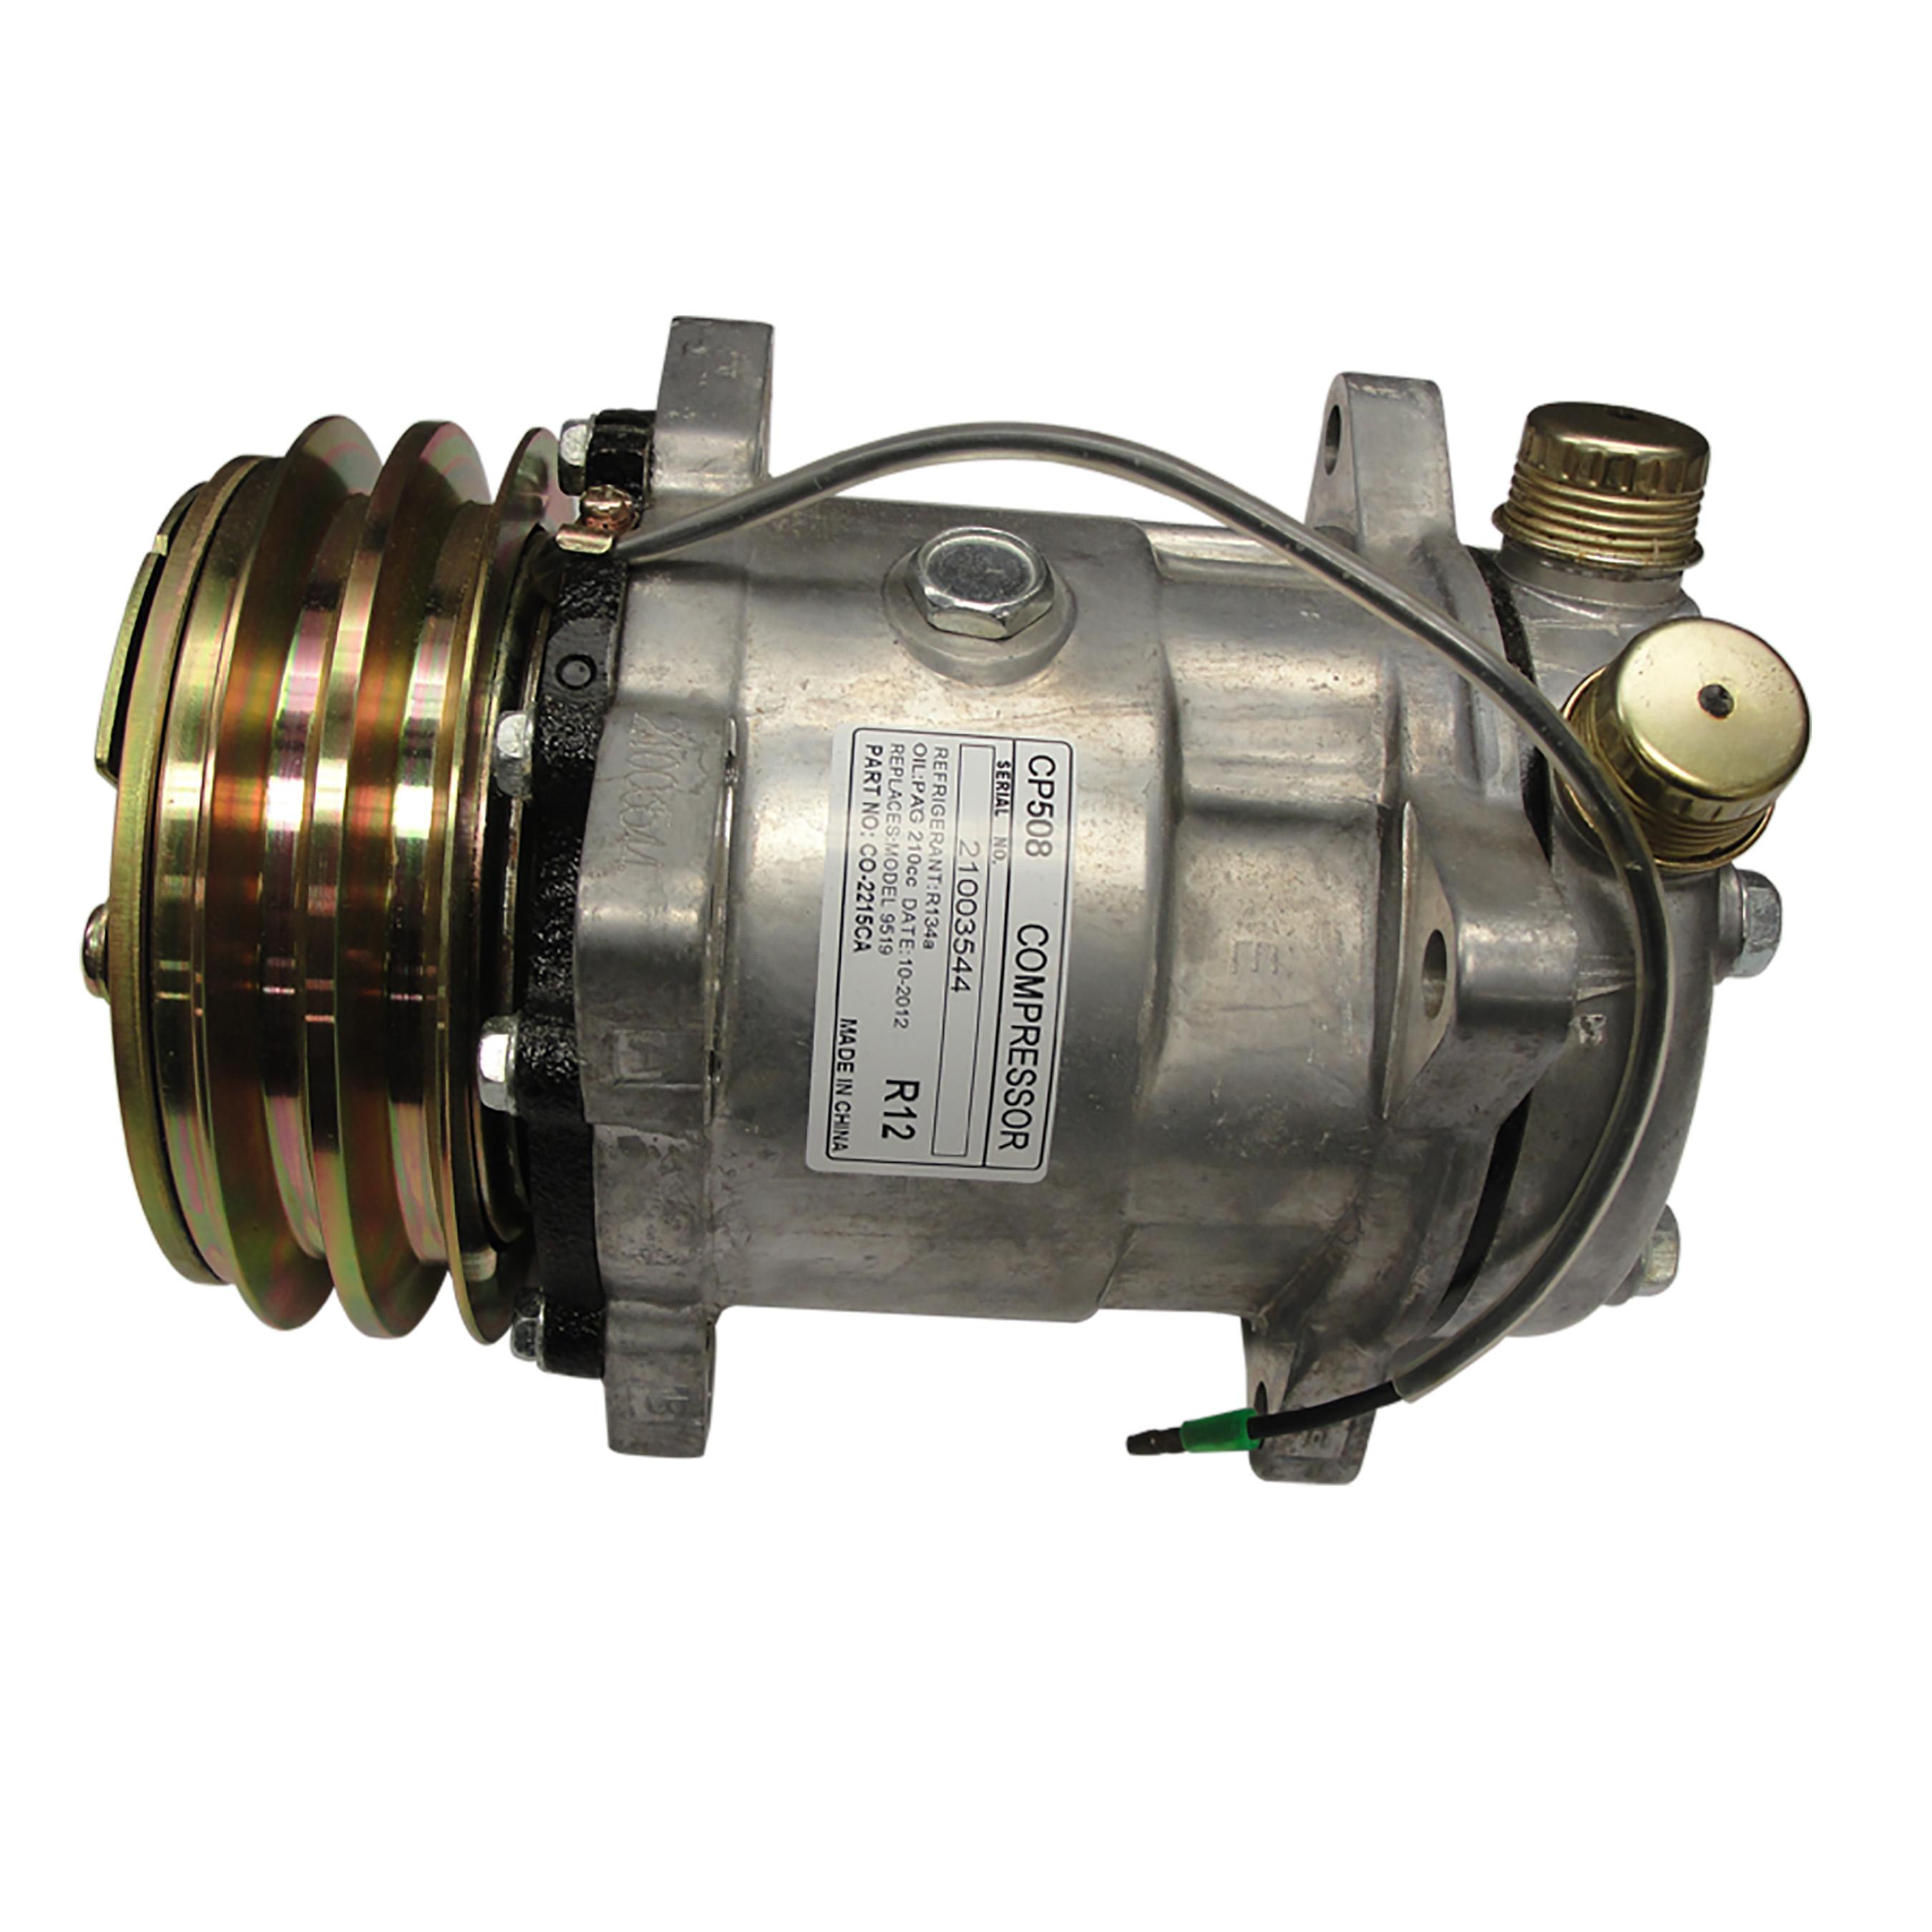 International Harvester Compressor Diameter: 5 1/2